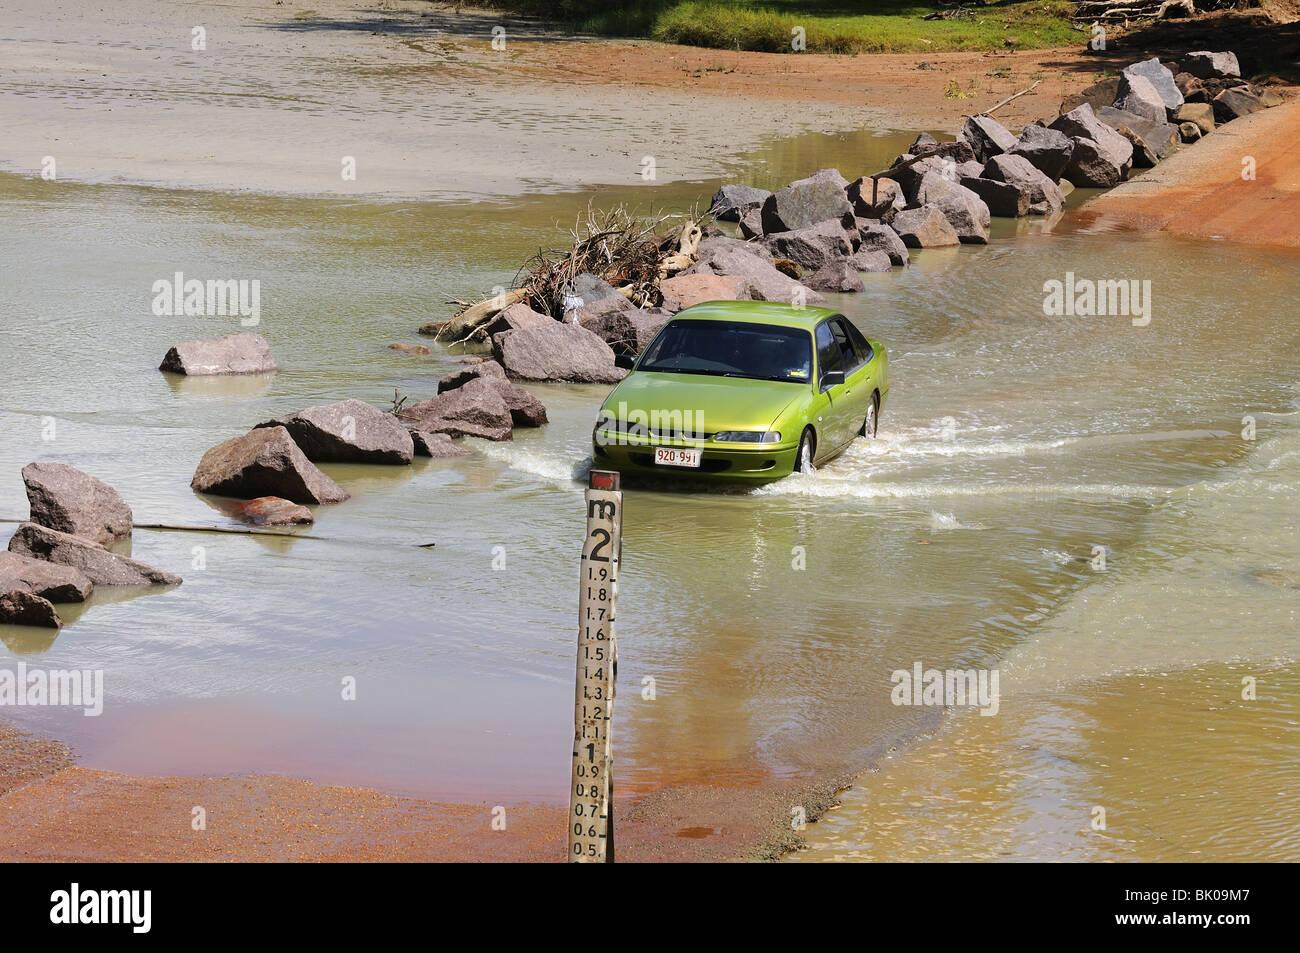 Car fording East Alligator River Crossing (Cahills Crossing)   Kakadu  National   Park Northern Territory, Australia - Stock Image